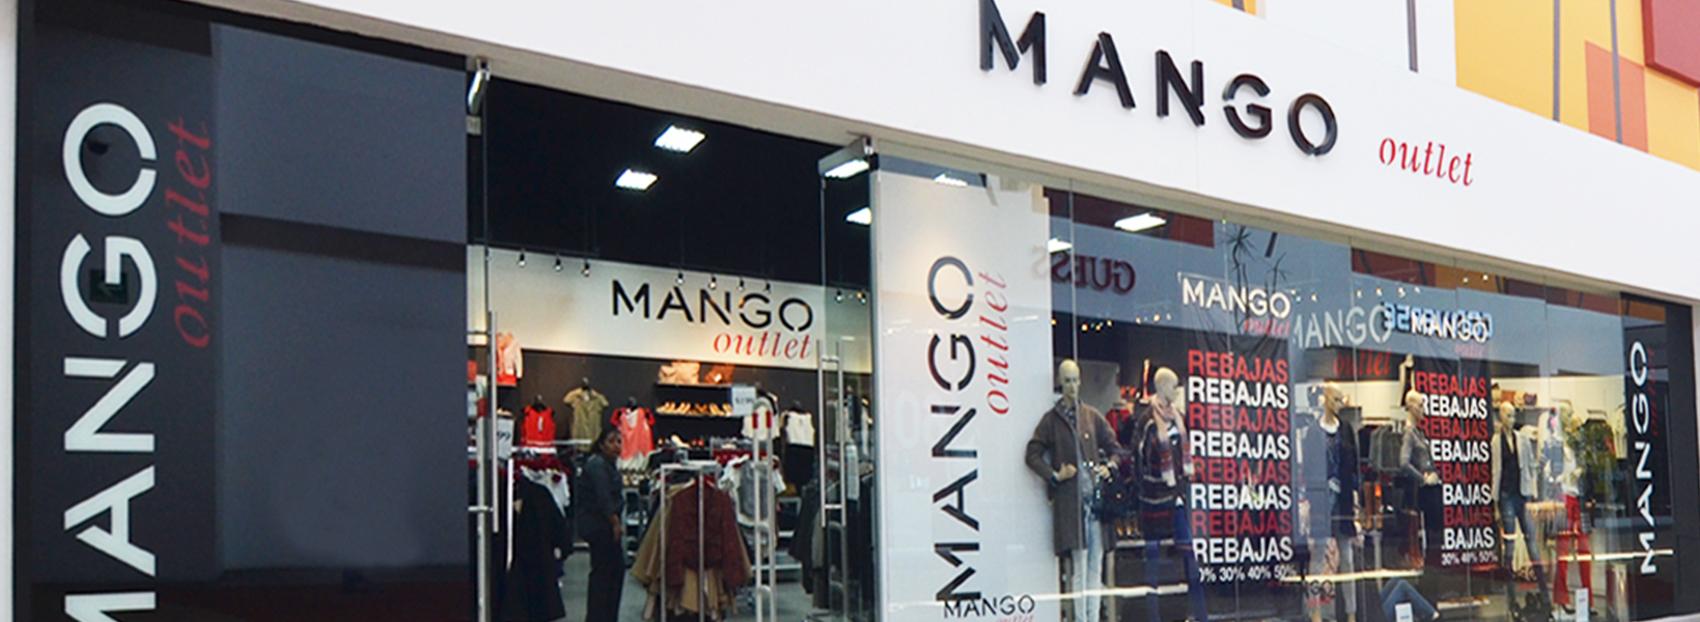 Mango outlet italia